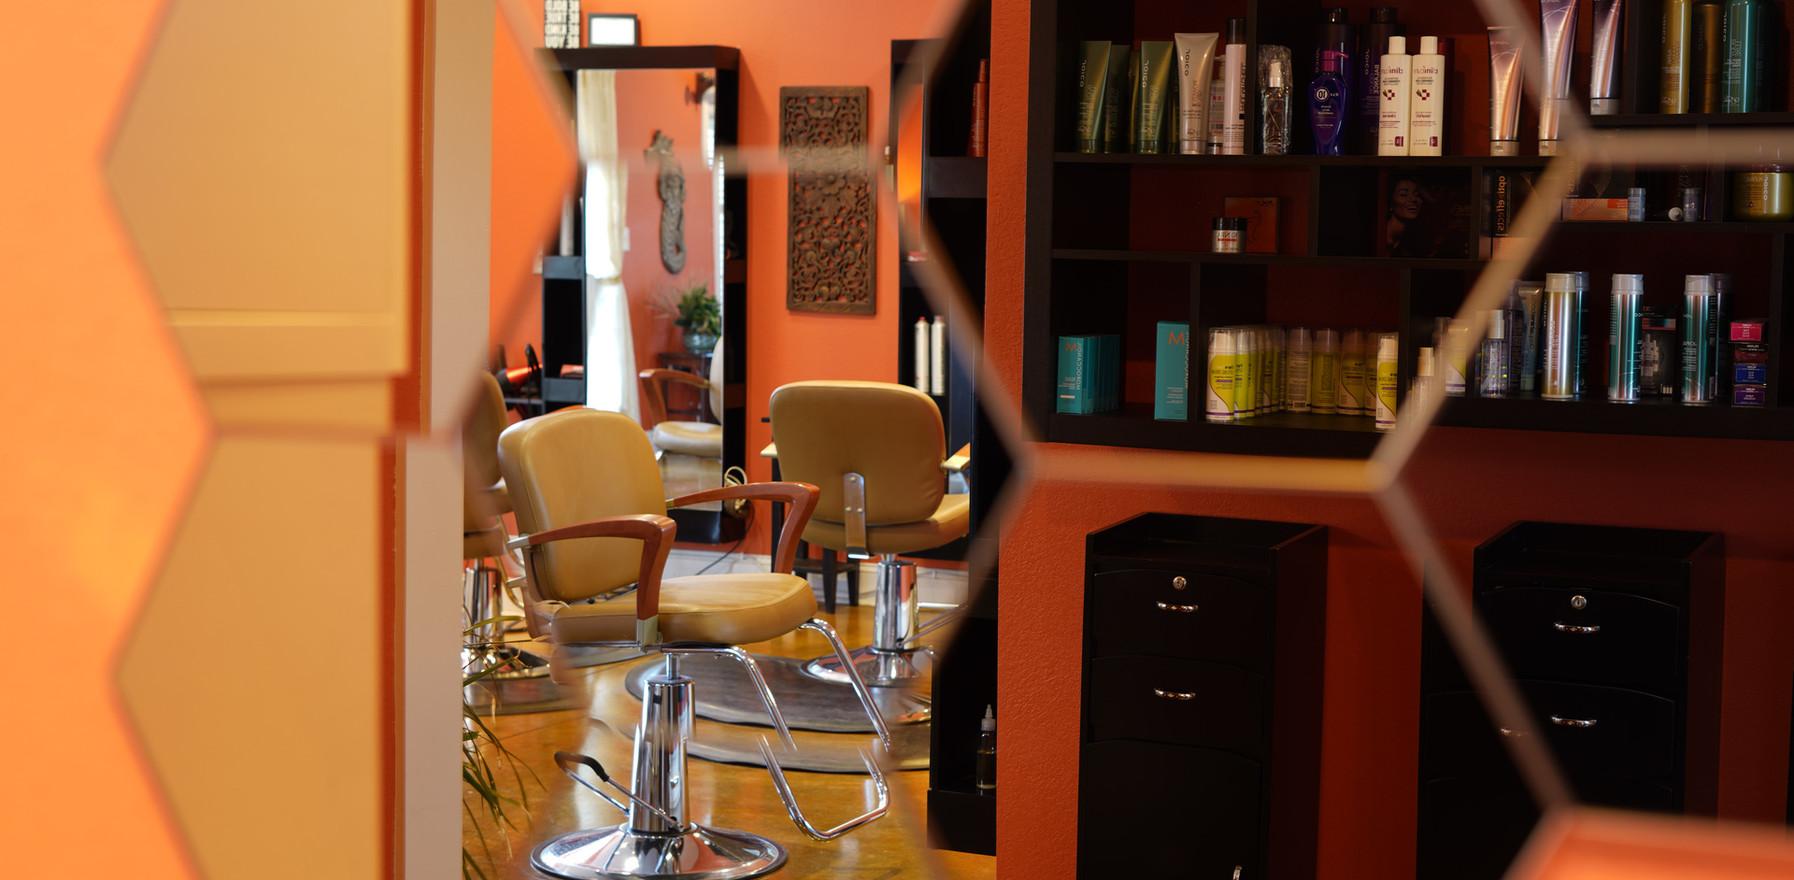 Its a modern salon & spa!